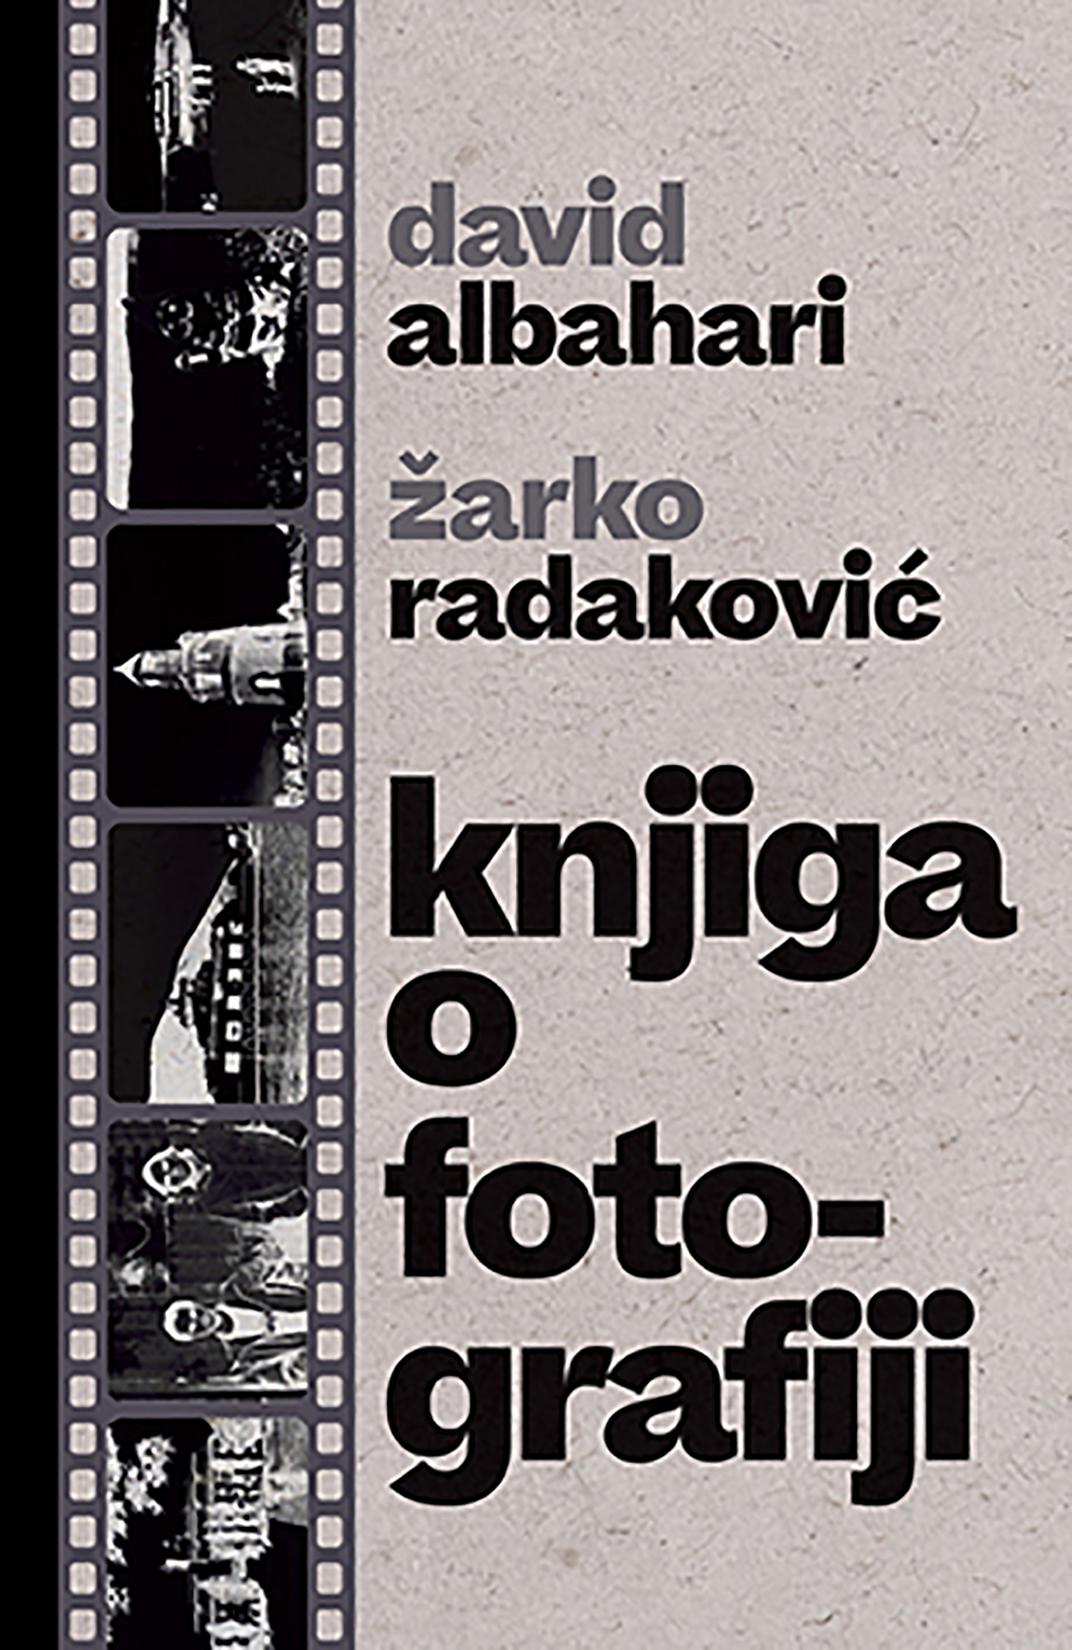 David Albahari, Žarko Radakovć, Knjiga o fotografiji, knjiga, knjige